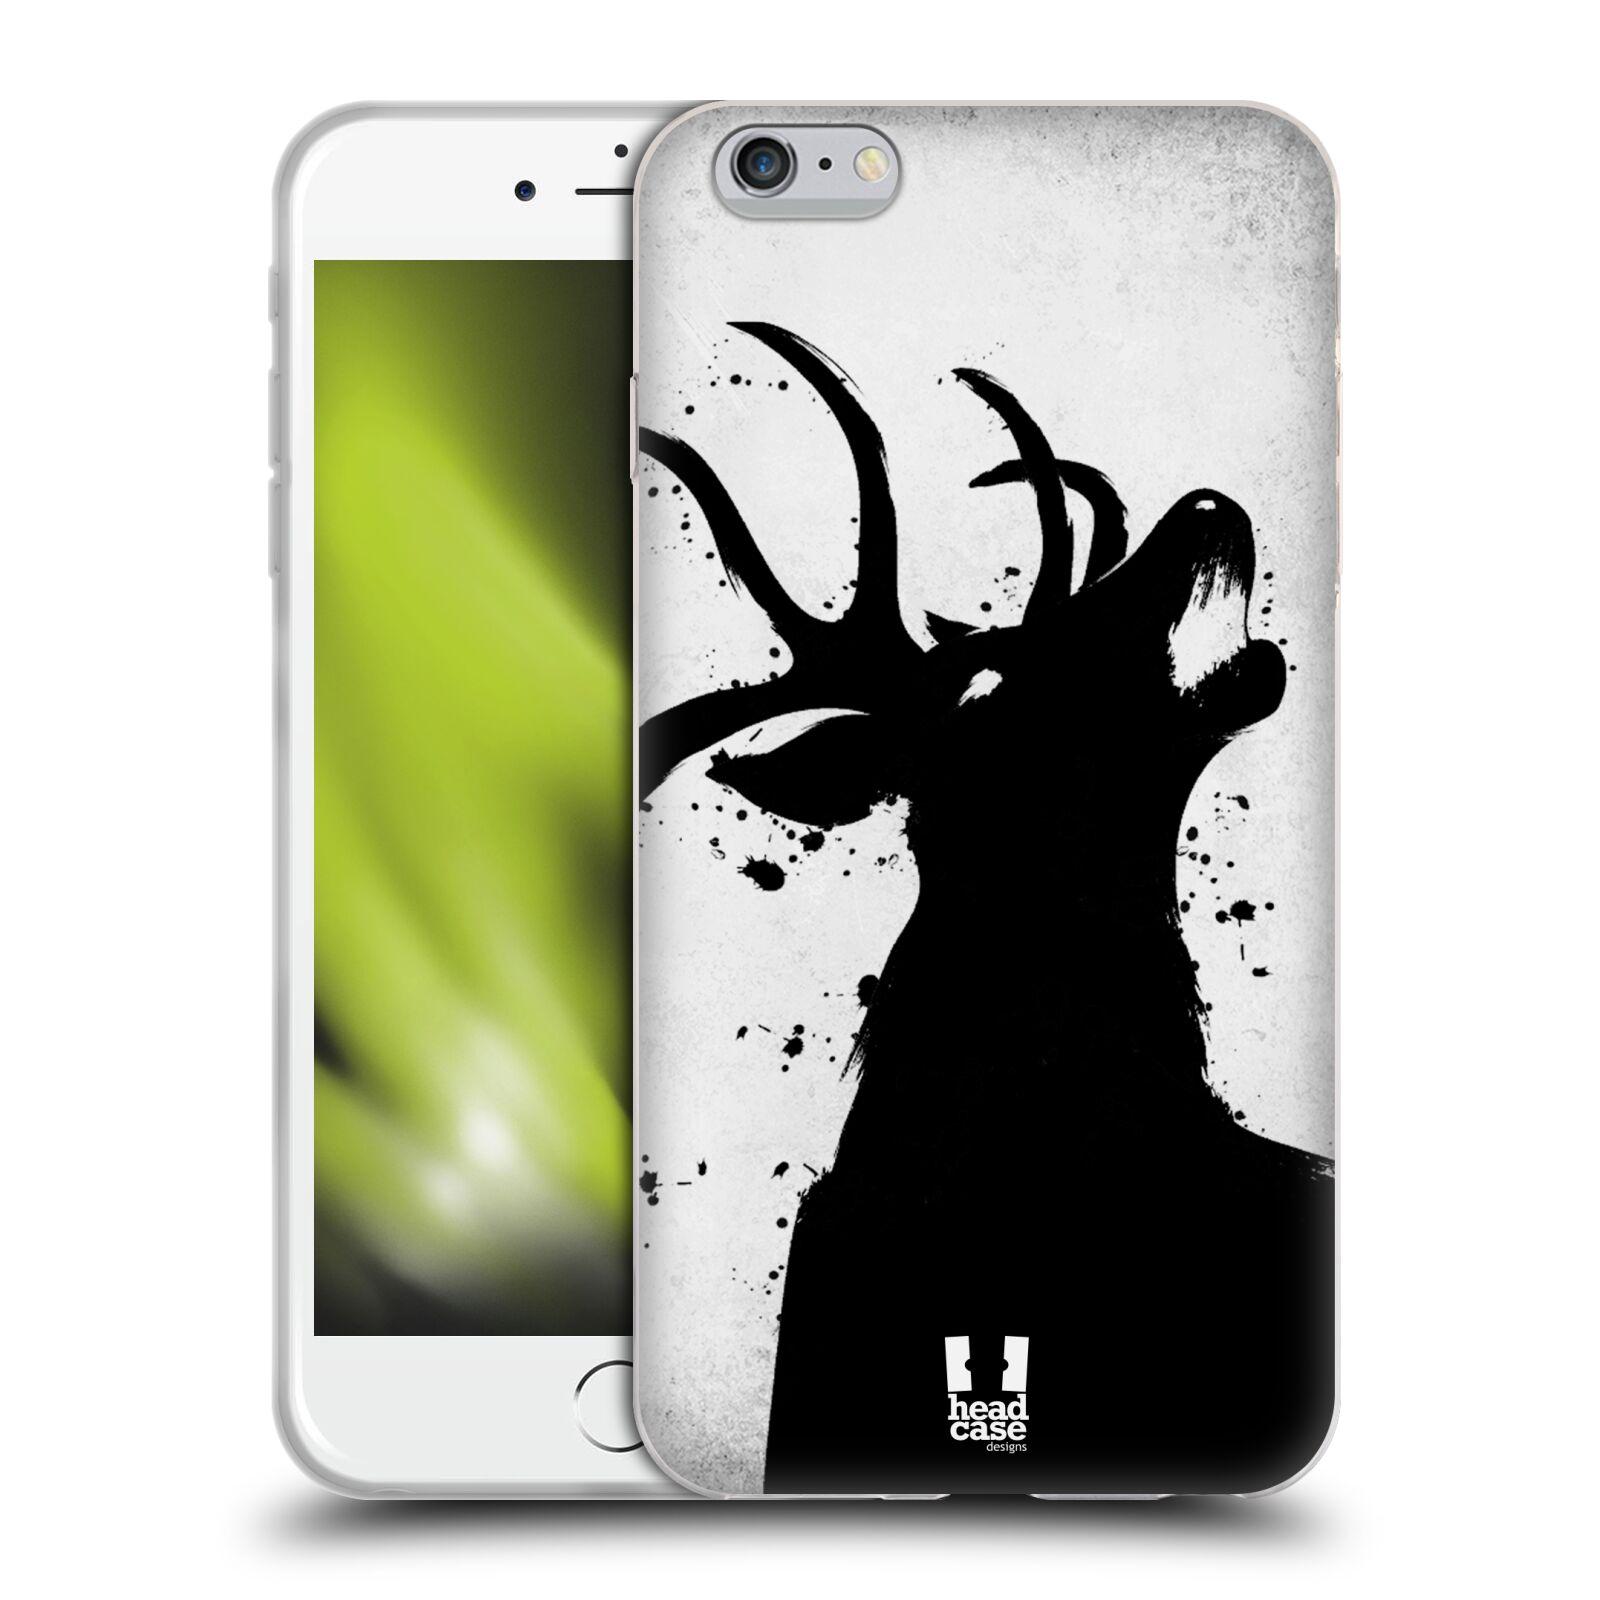 HEAD CASE silikonový obal na mobil Apple Iphone 6 PLUS/ 6S PLUS vzor Kresba tuš zvíře jelen